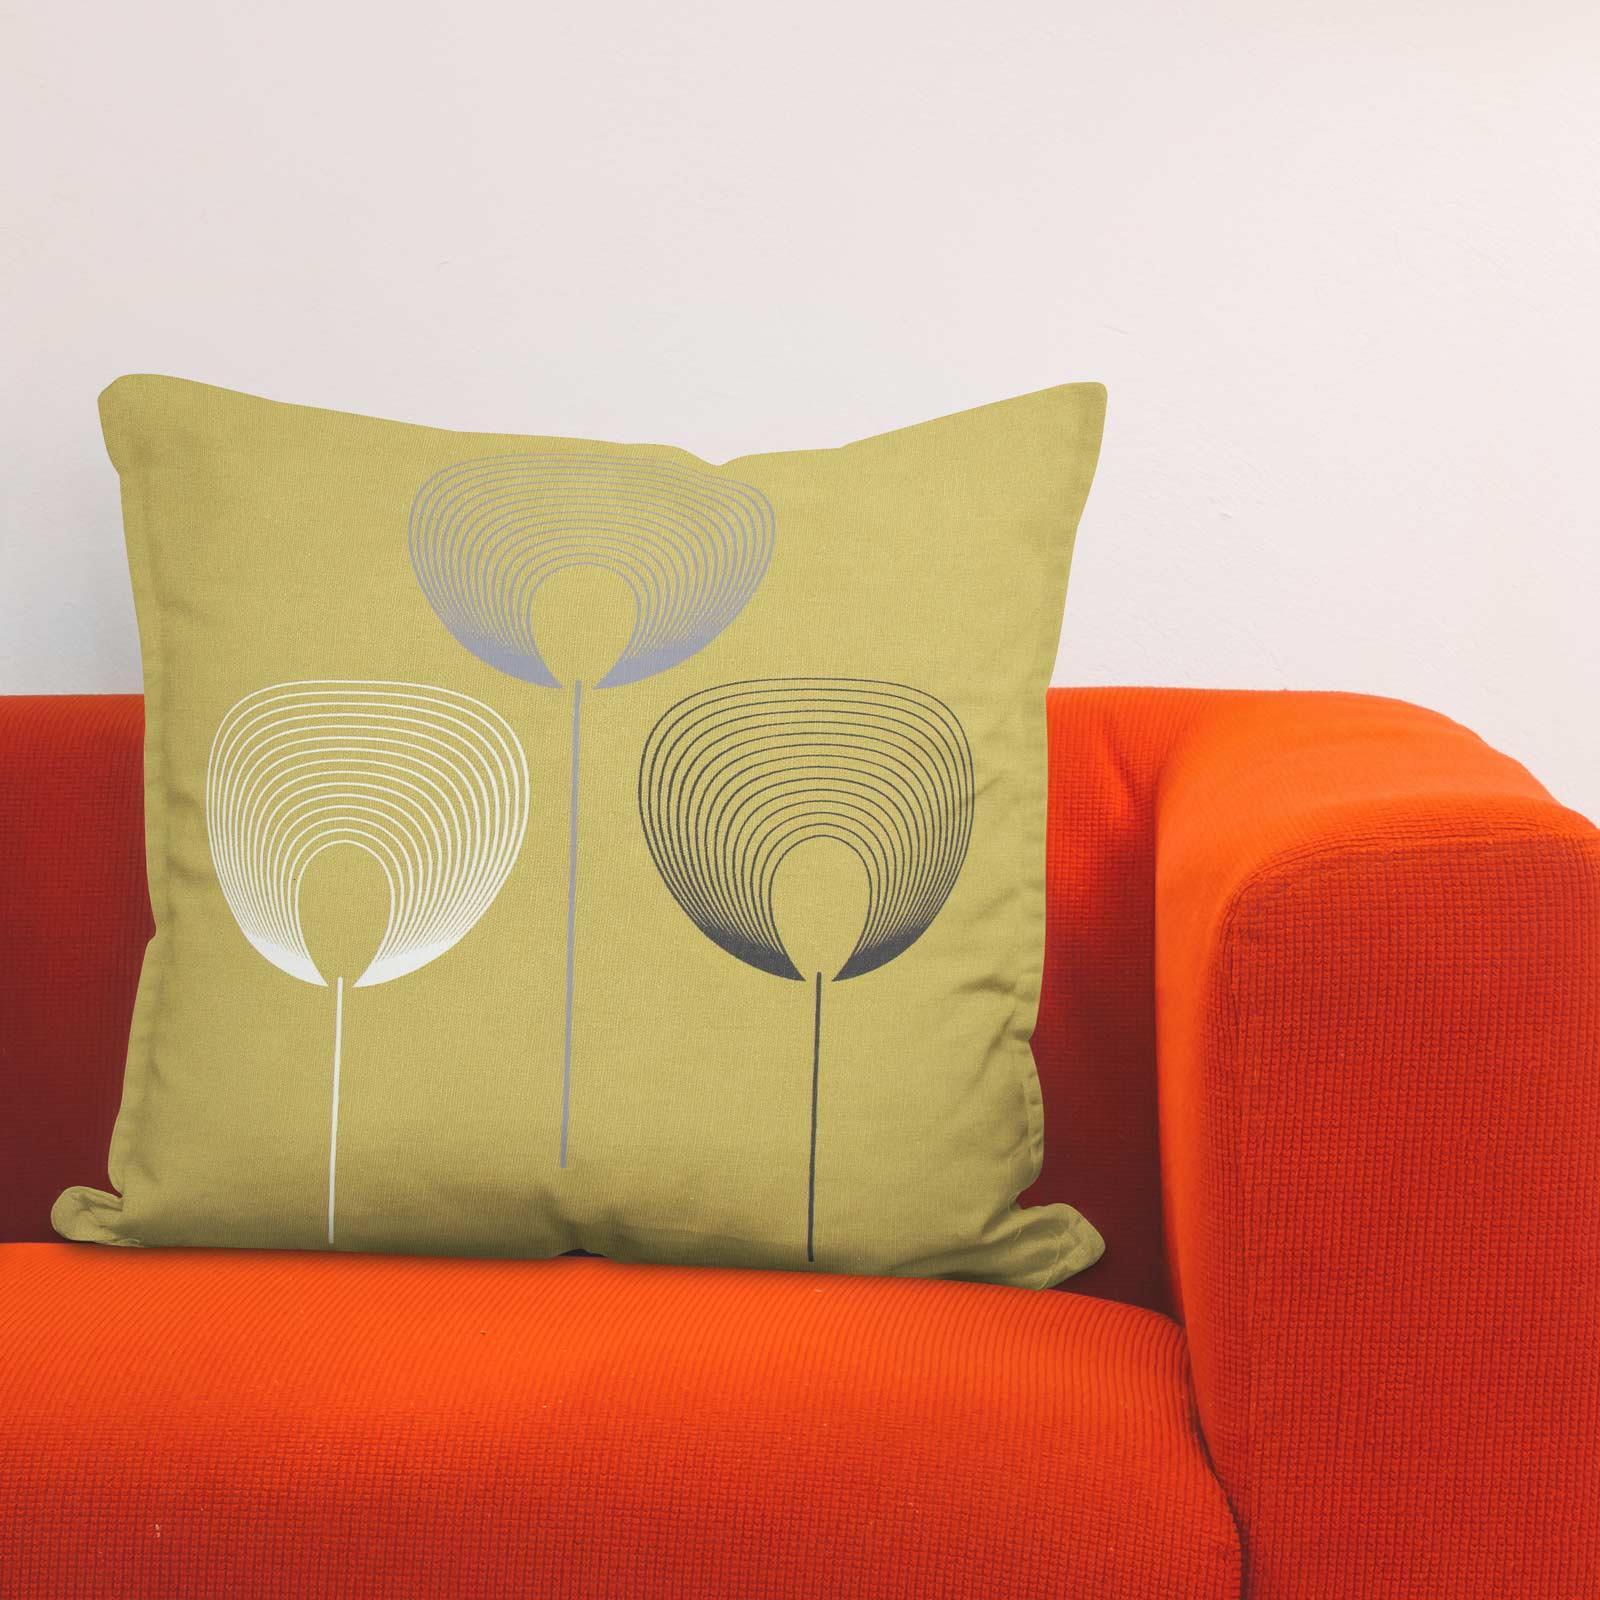 Geometrica-Cushion-Covers-Cojines-De-Impresion-Floral-Gris-Beige-Ocre-cubre-17-034-X-17-034 miniatura 7